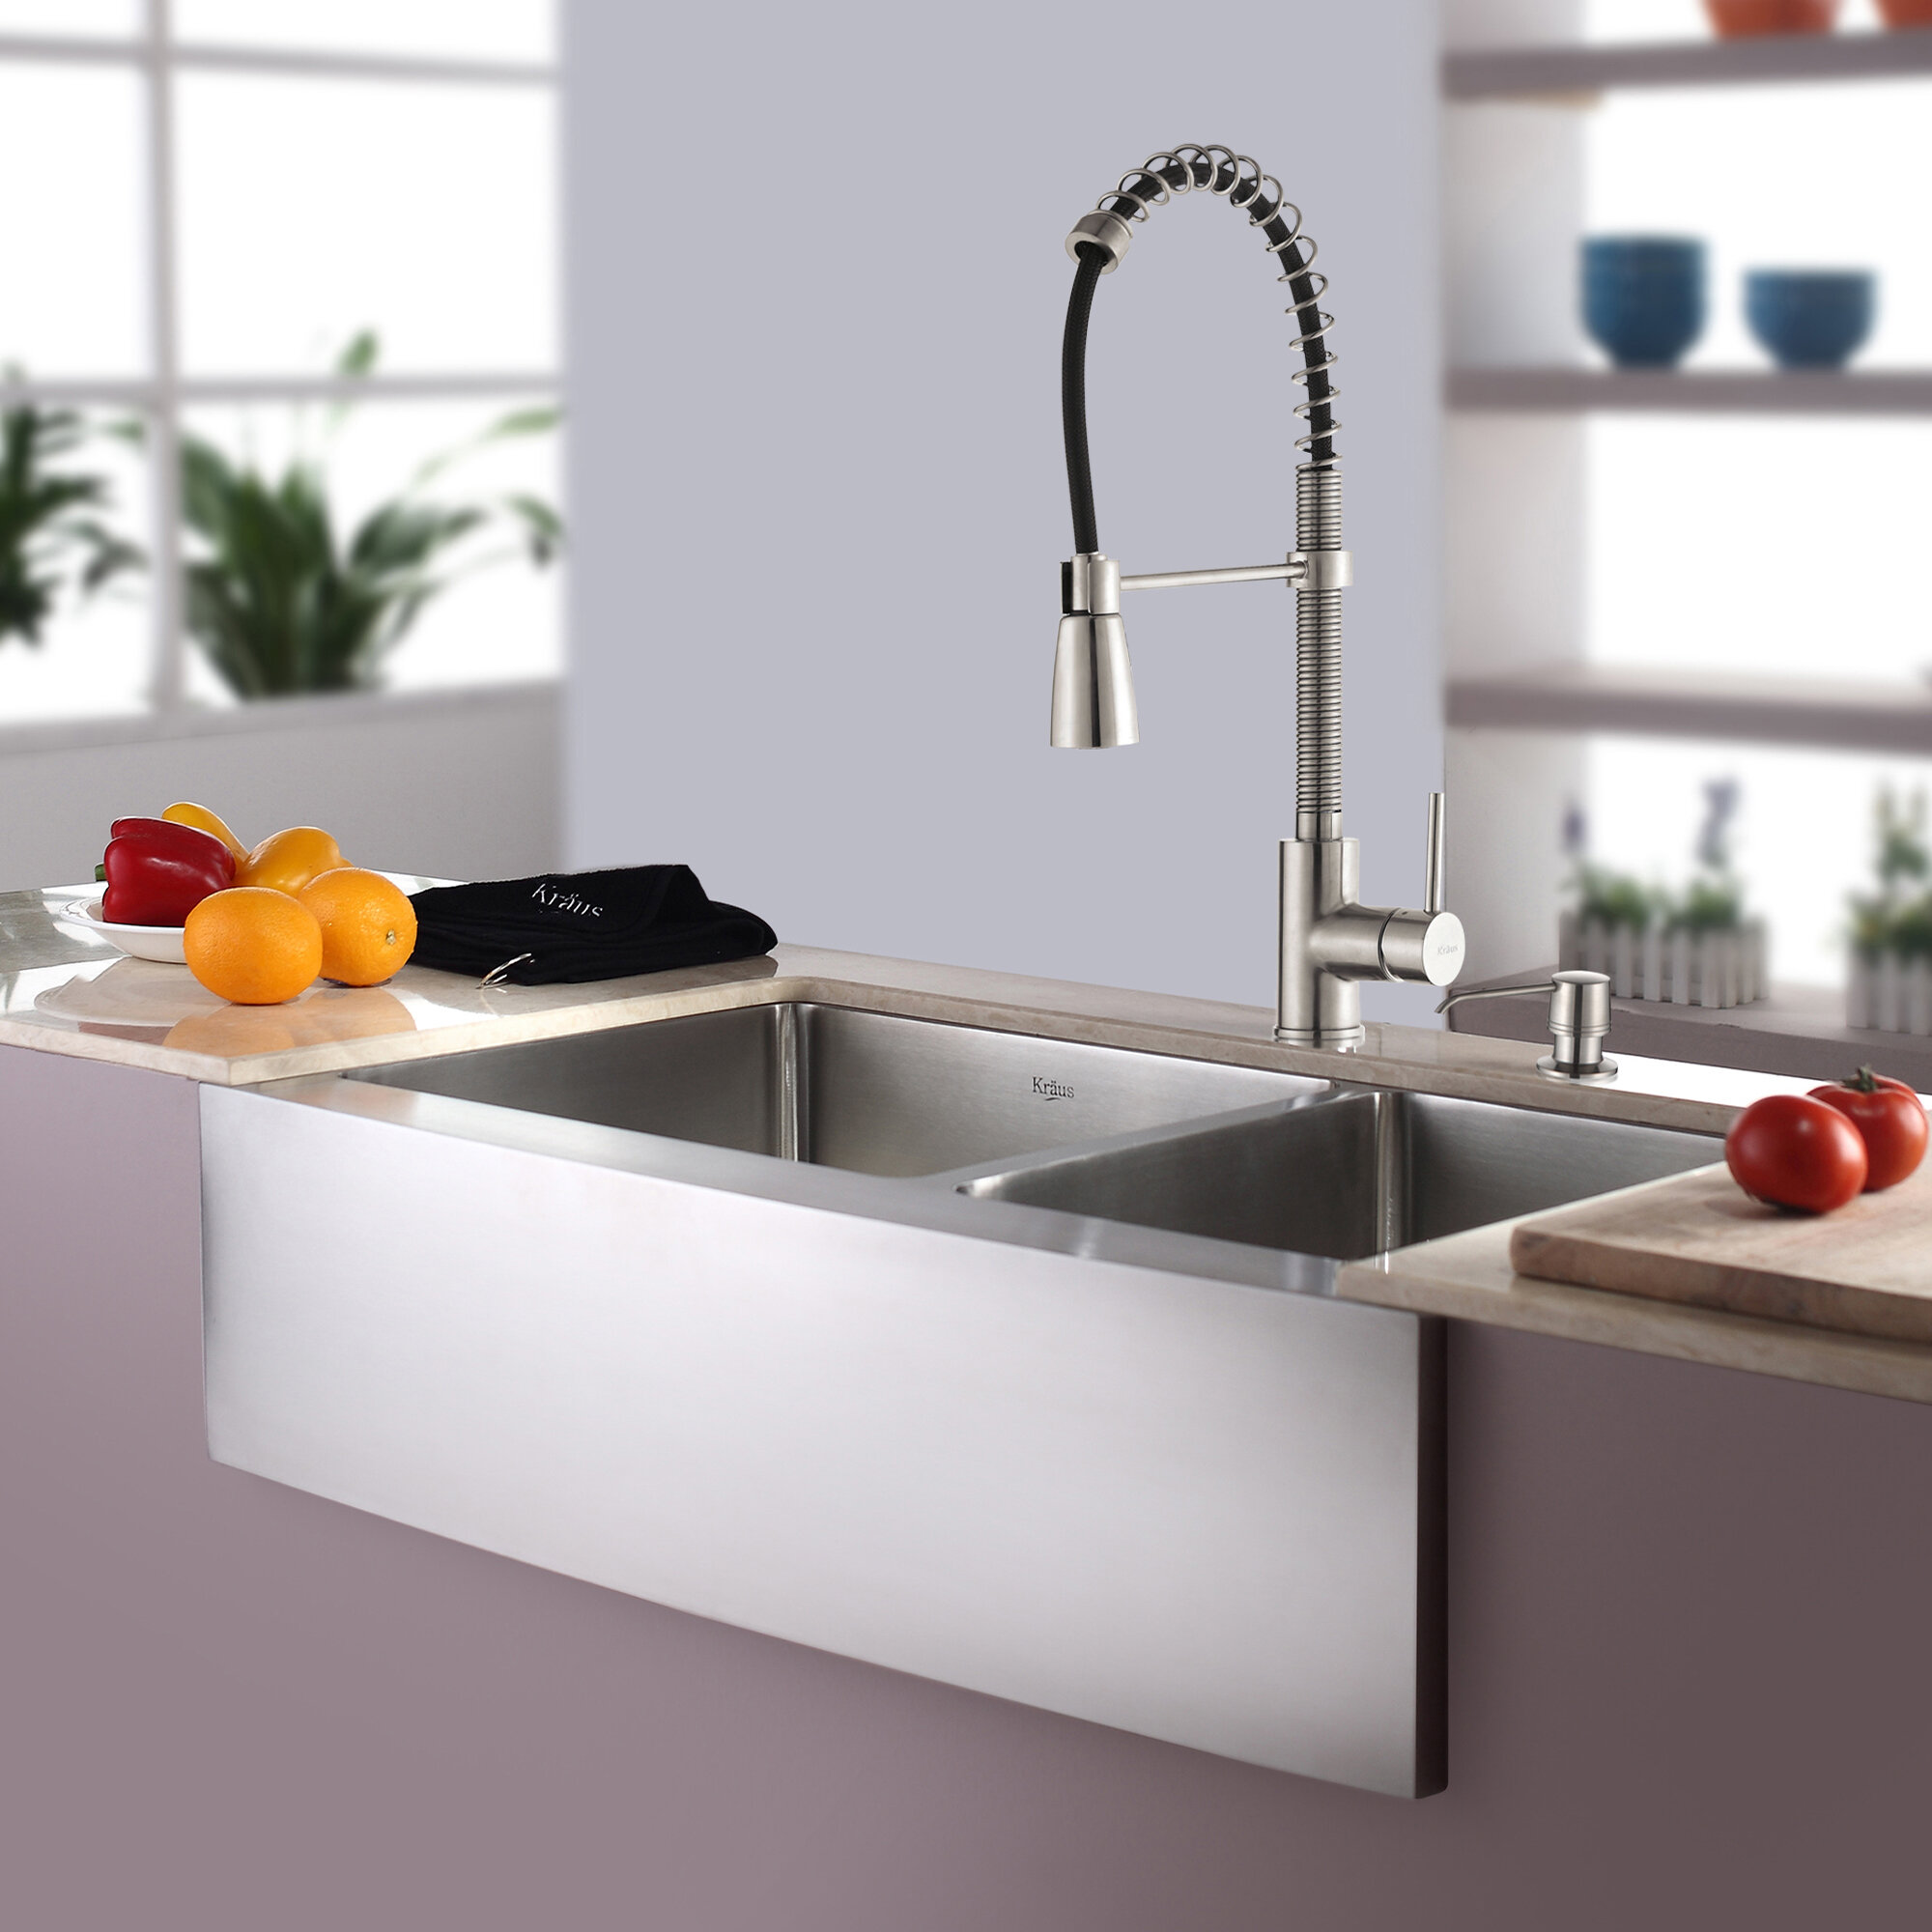 Khf203 33 Kpf1612 Ksd30ss Kitchen Combos L X 21 W Double Basin Farmhouse A Sink With Faucet